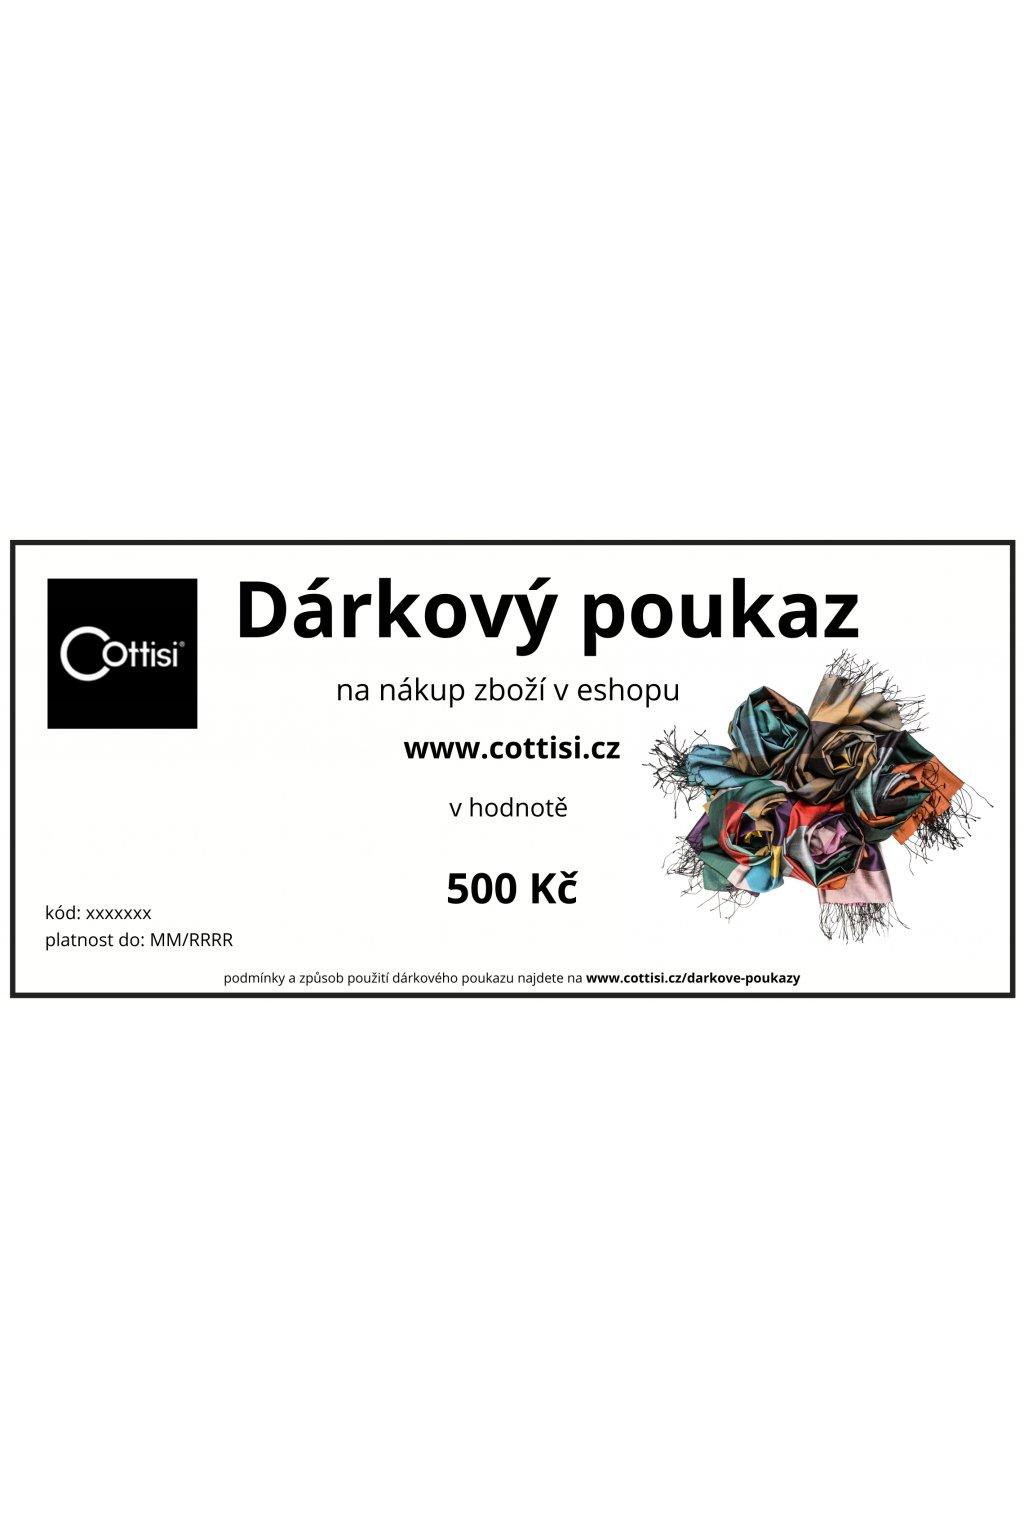 DV 500